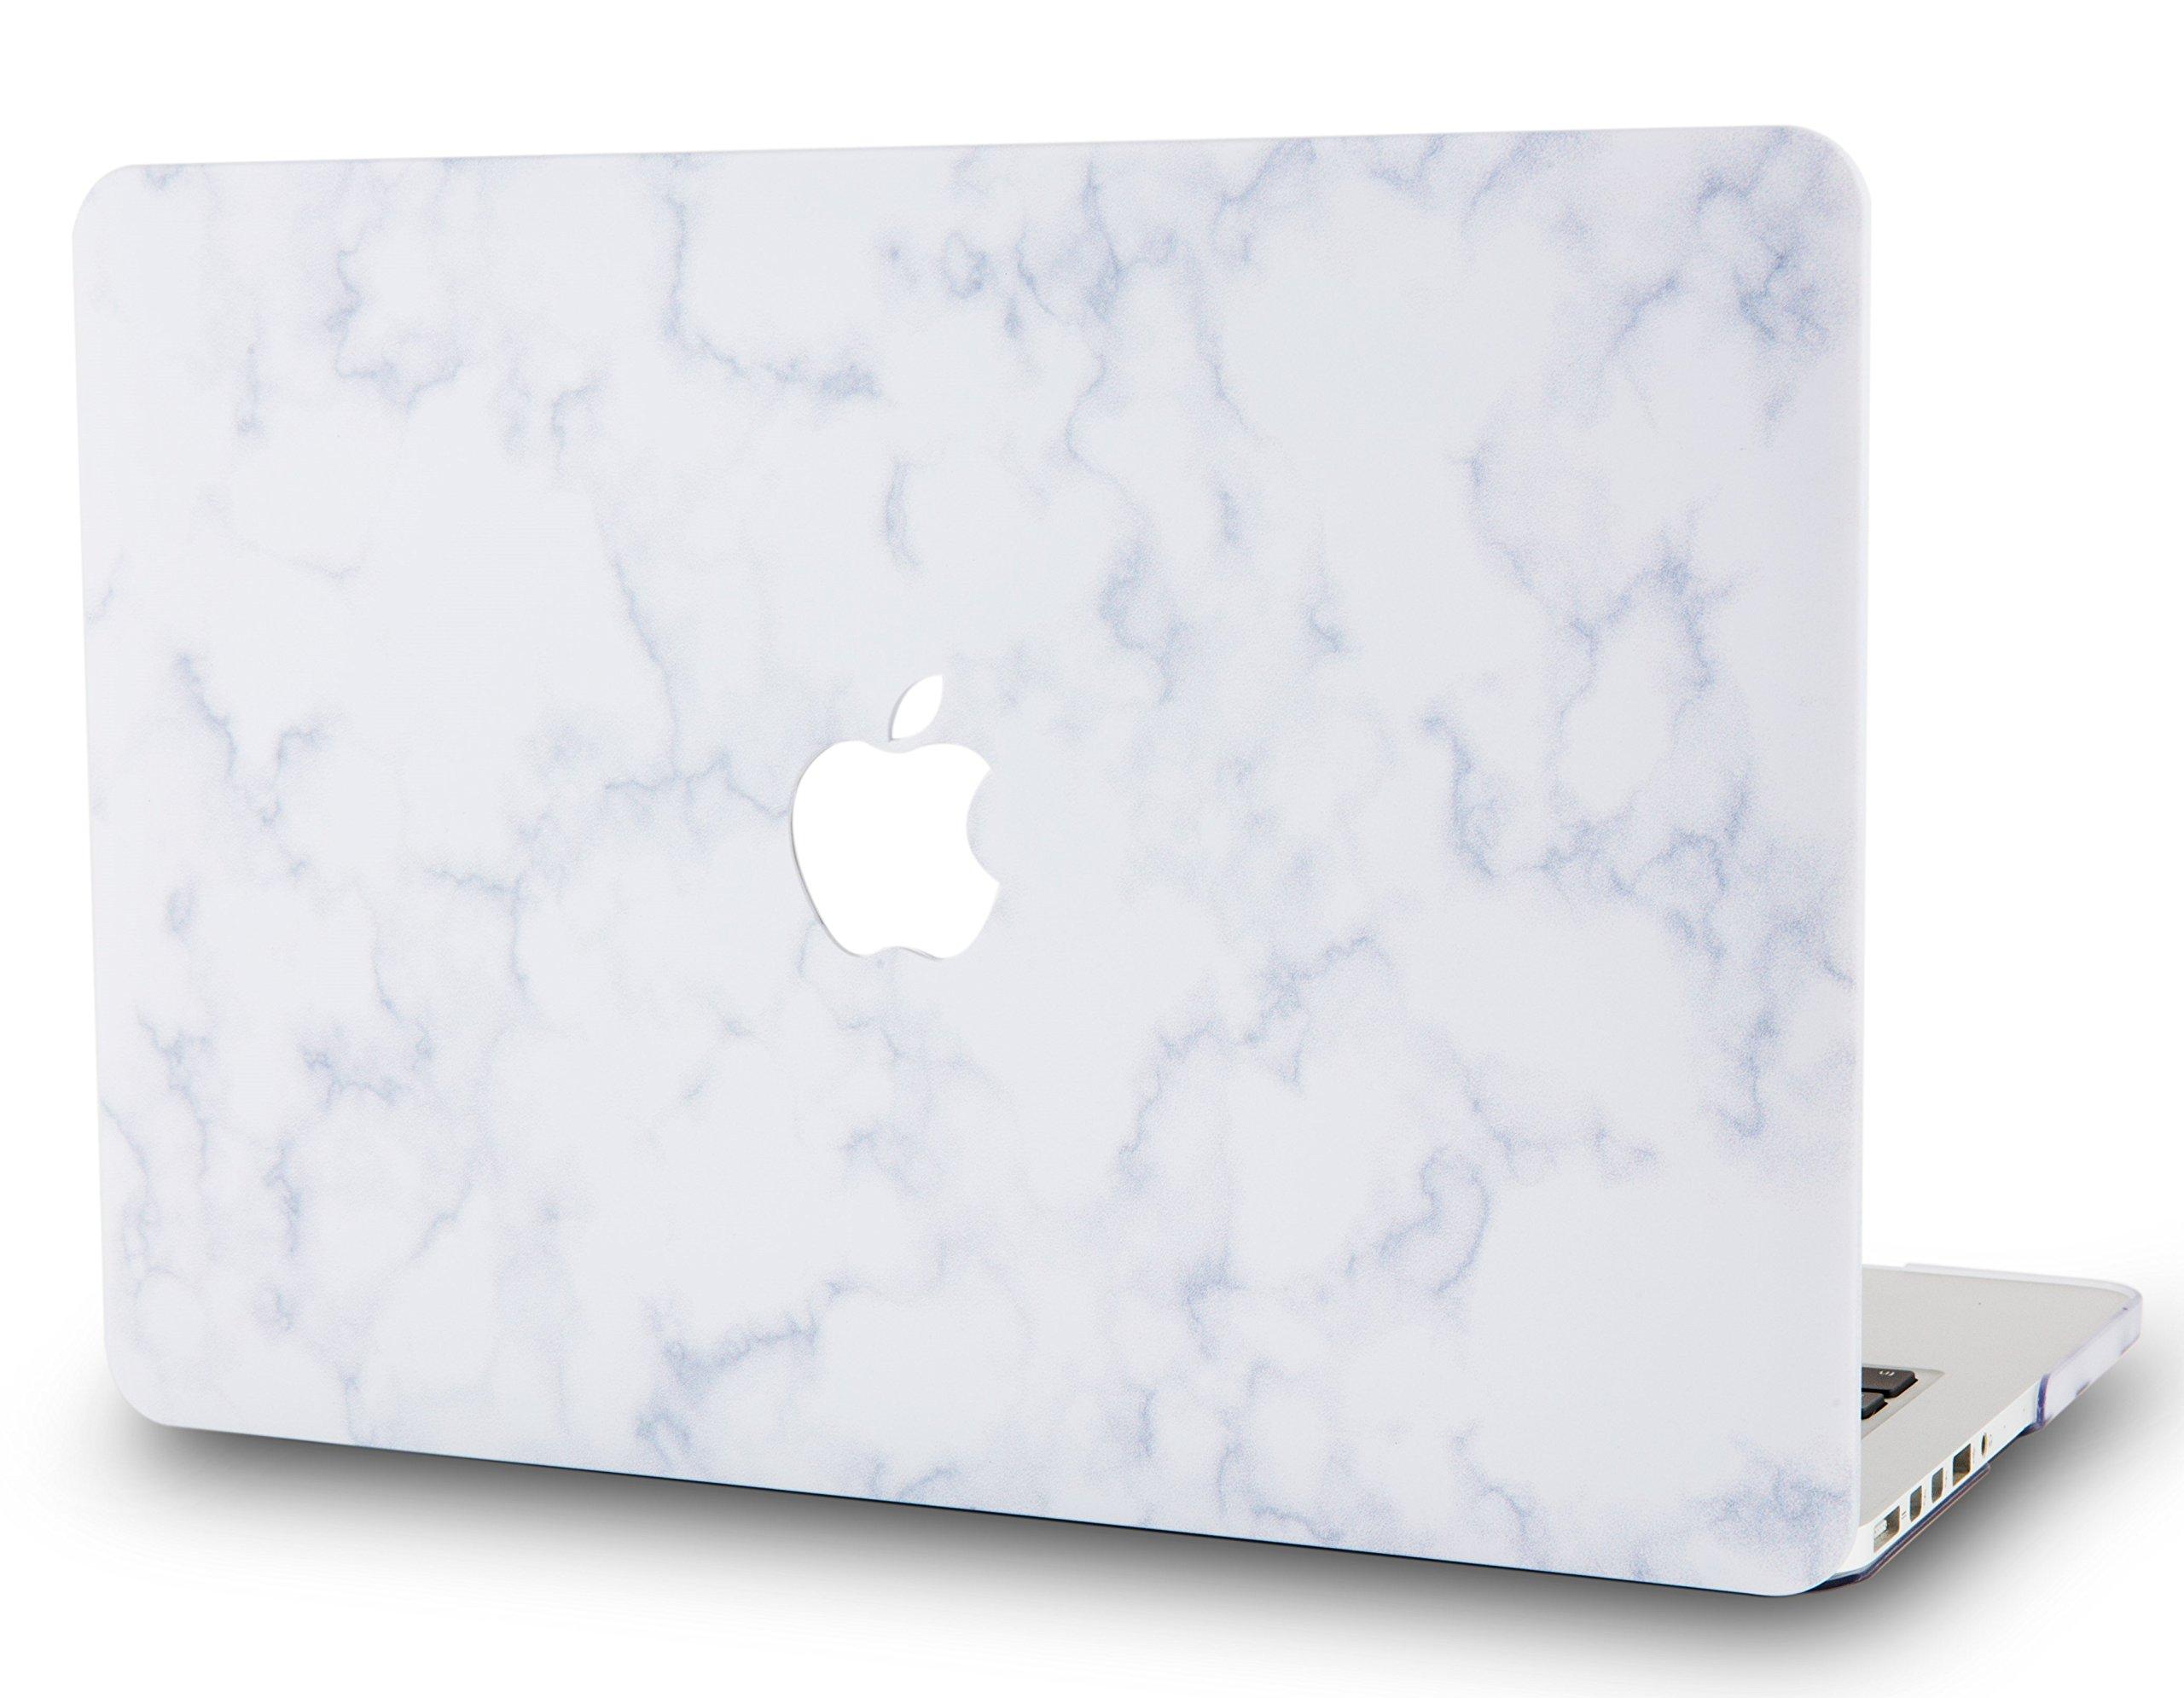 "LuvCaseLaptopCaseforOld MacBook Pro 13"" Retina Display (2015/2014/2013/2012 Release) A1502/A1425RubberizedPlasticHardShellCover (White Cloud Marble)"